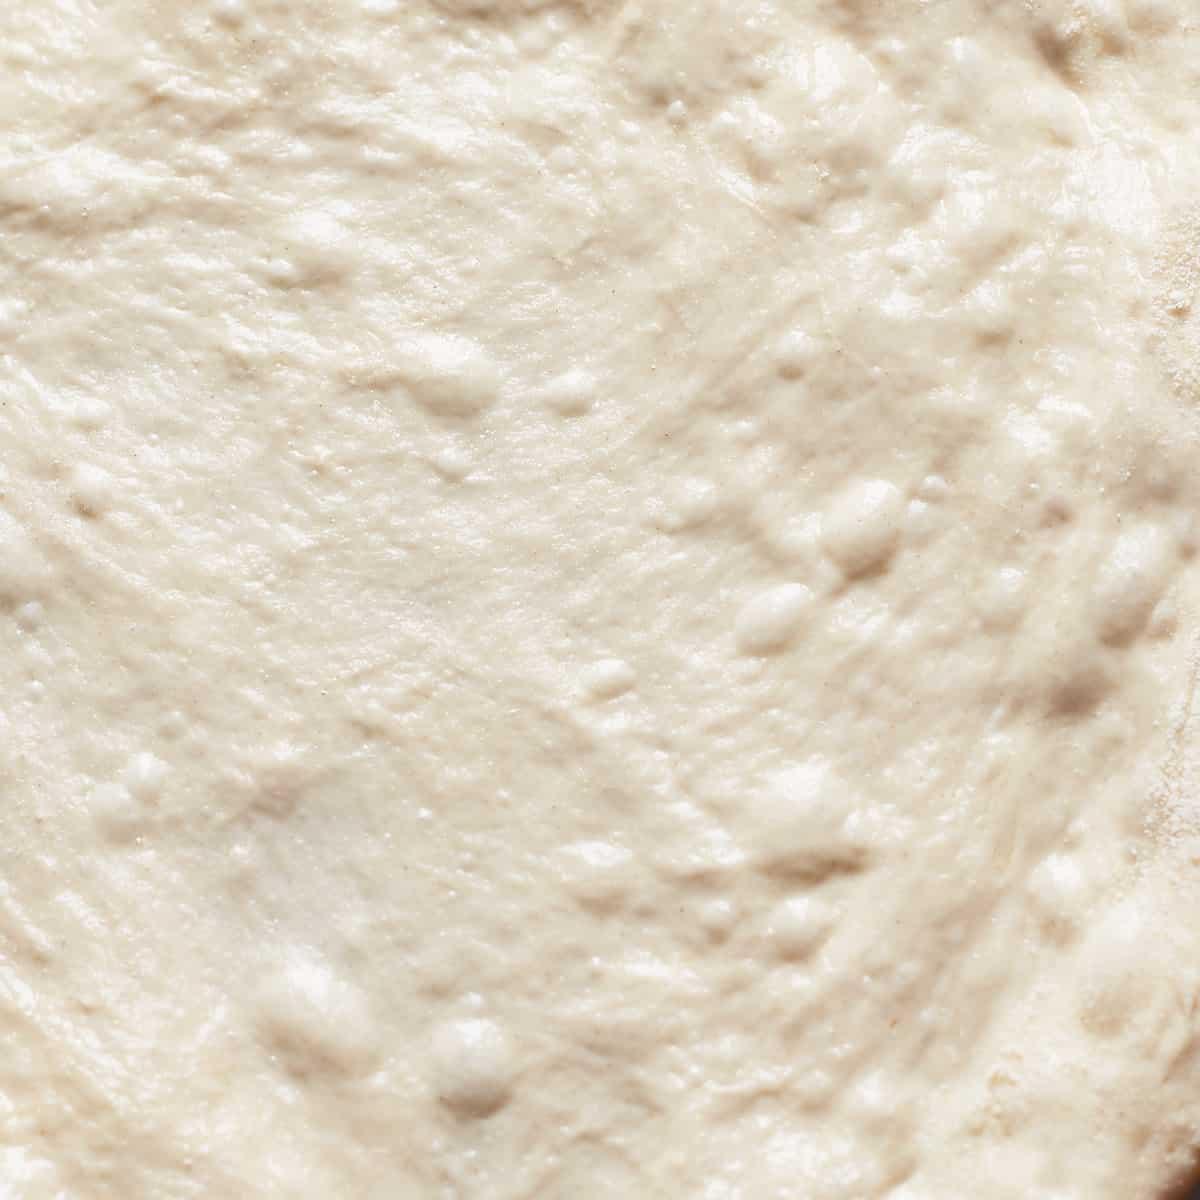 Close up of raw pizza dough